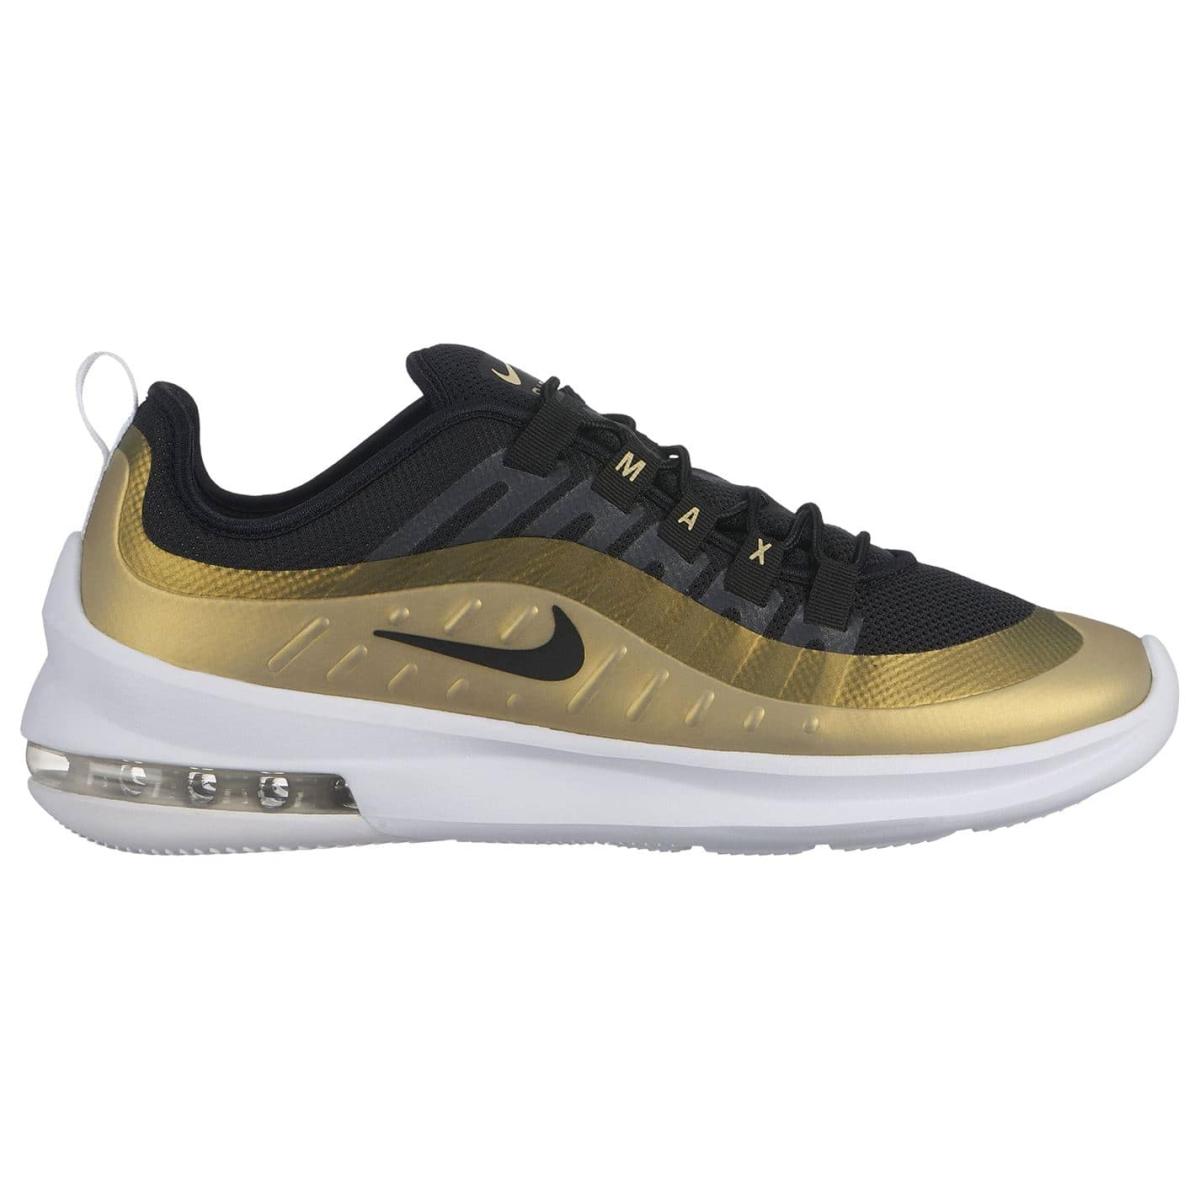 Nike Air Max Axis Turnschuhe Sportschuhe Herren Schwarz_Blk_Gold